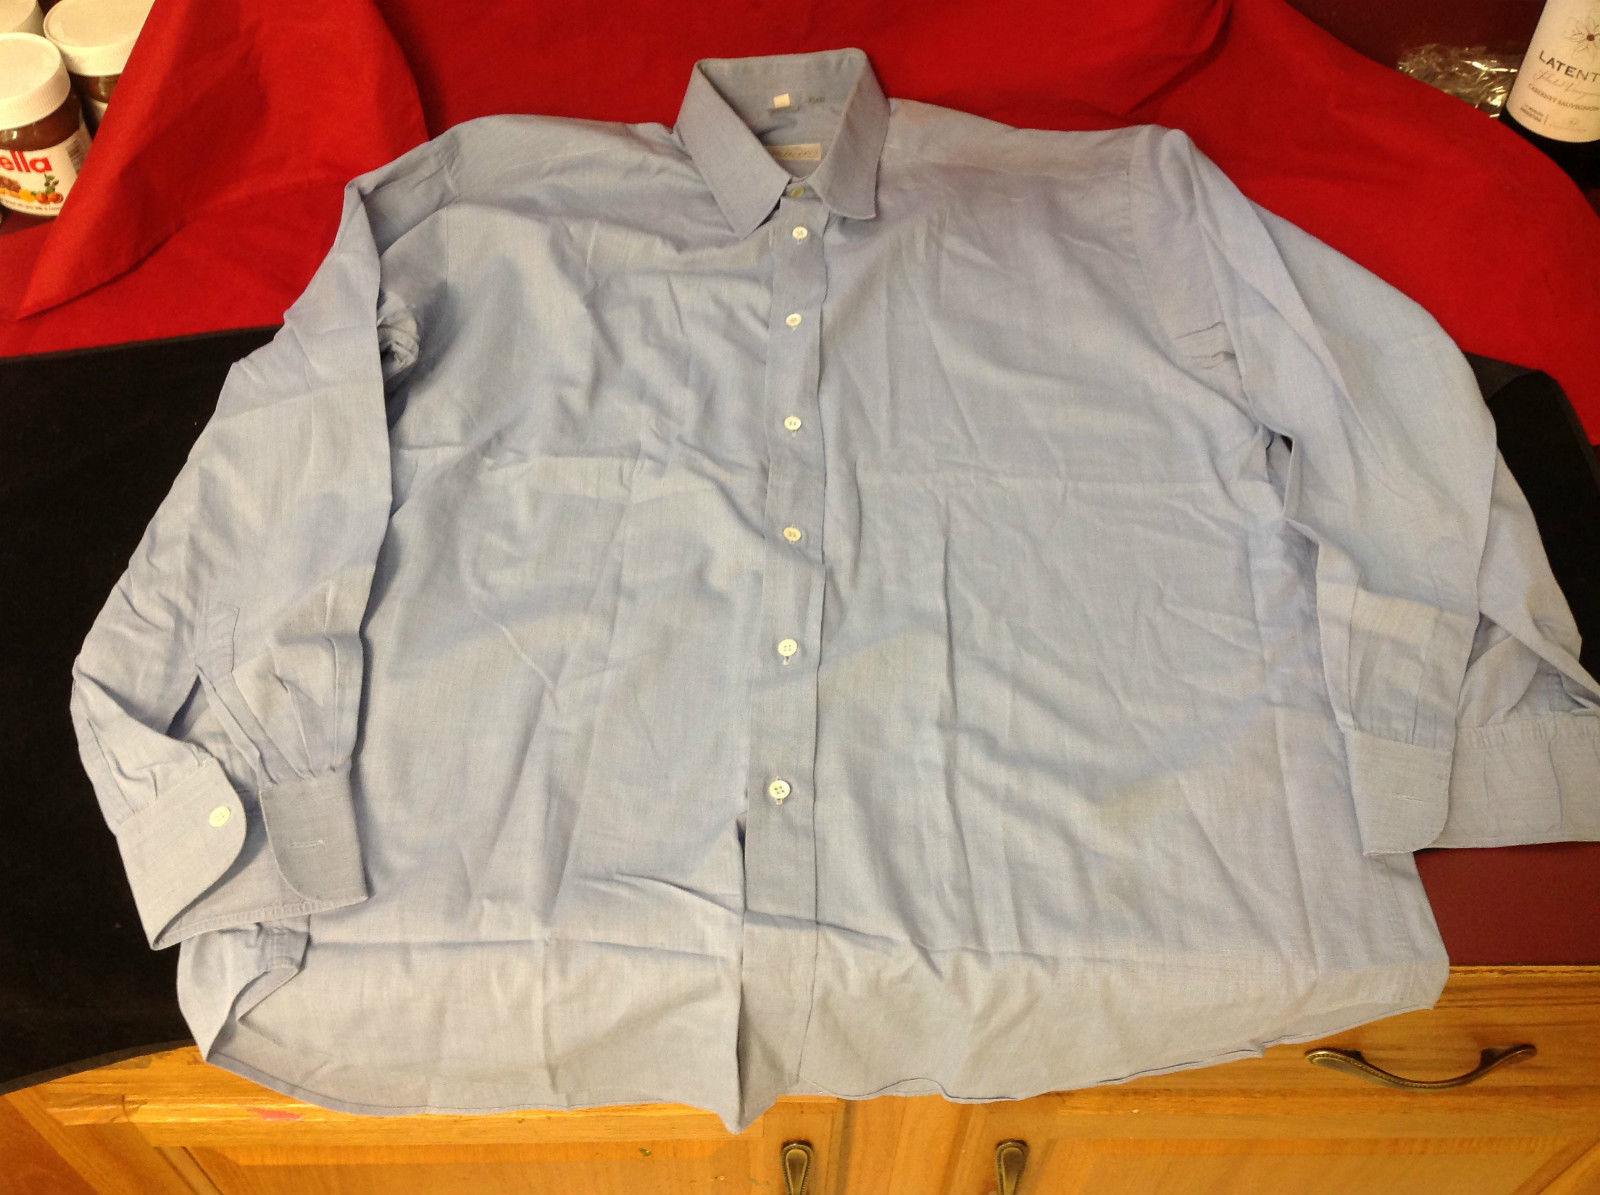 Tiatteli Mens Light Blue Long Sleeve Dress Shirt Made in Italy Size 16 Regular